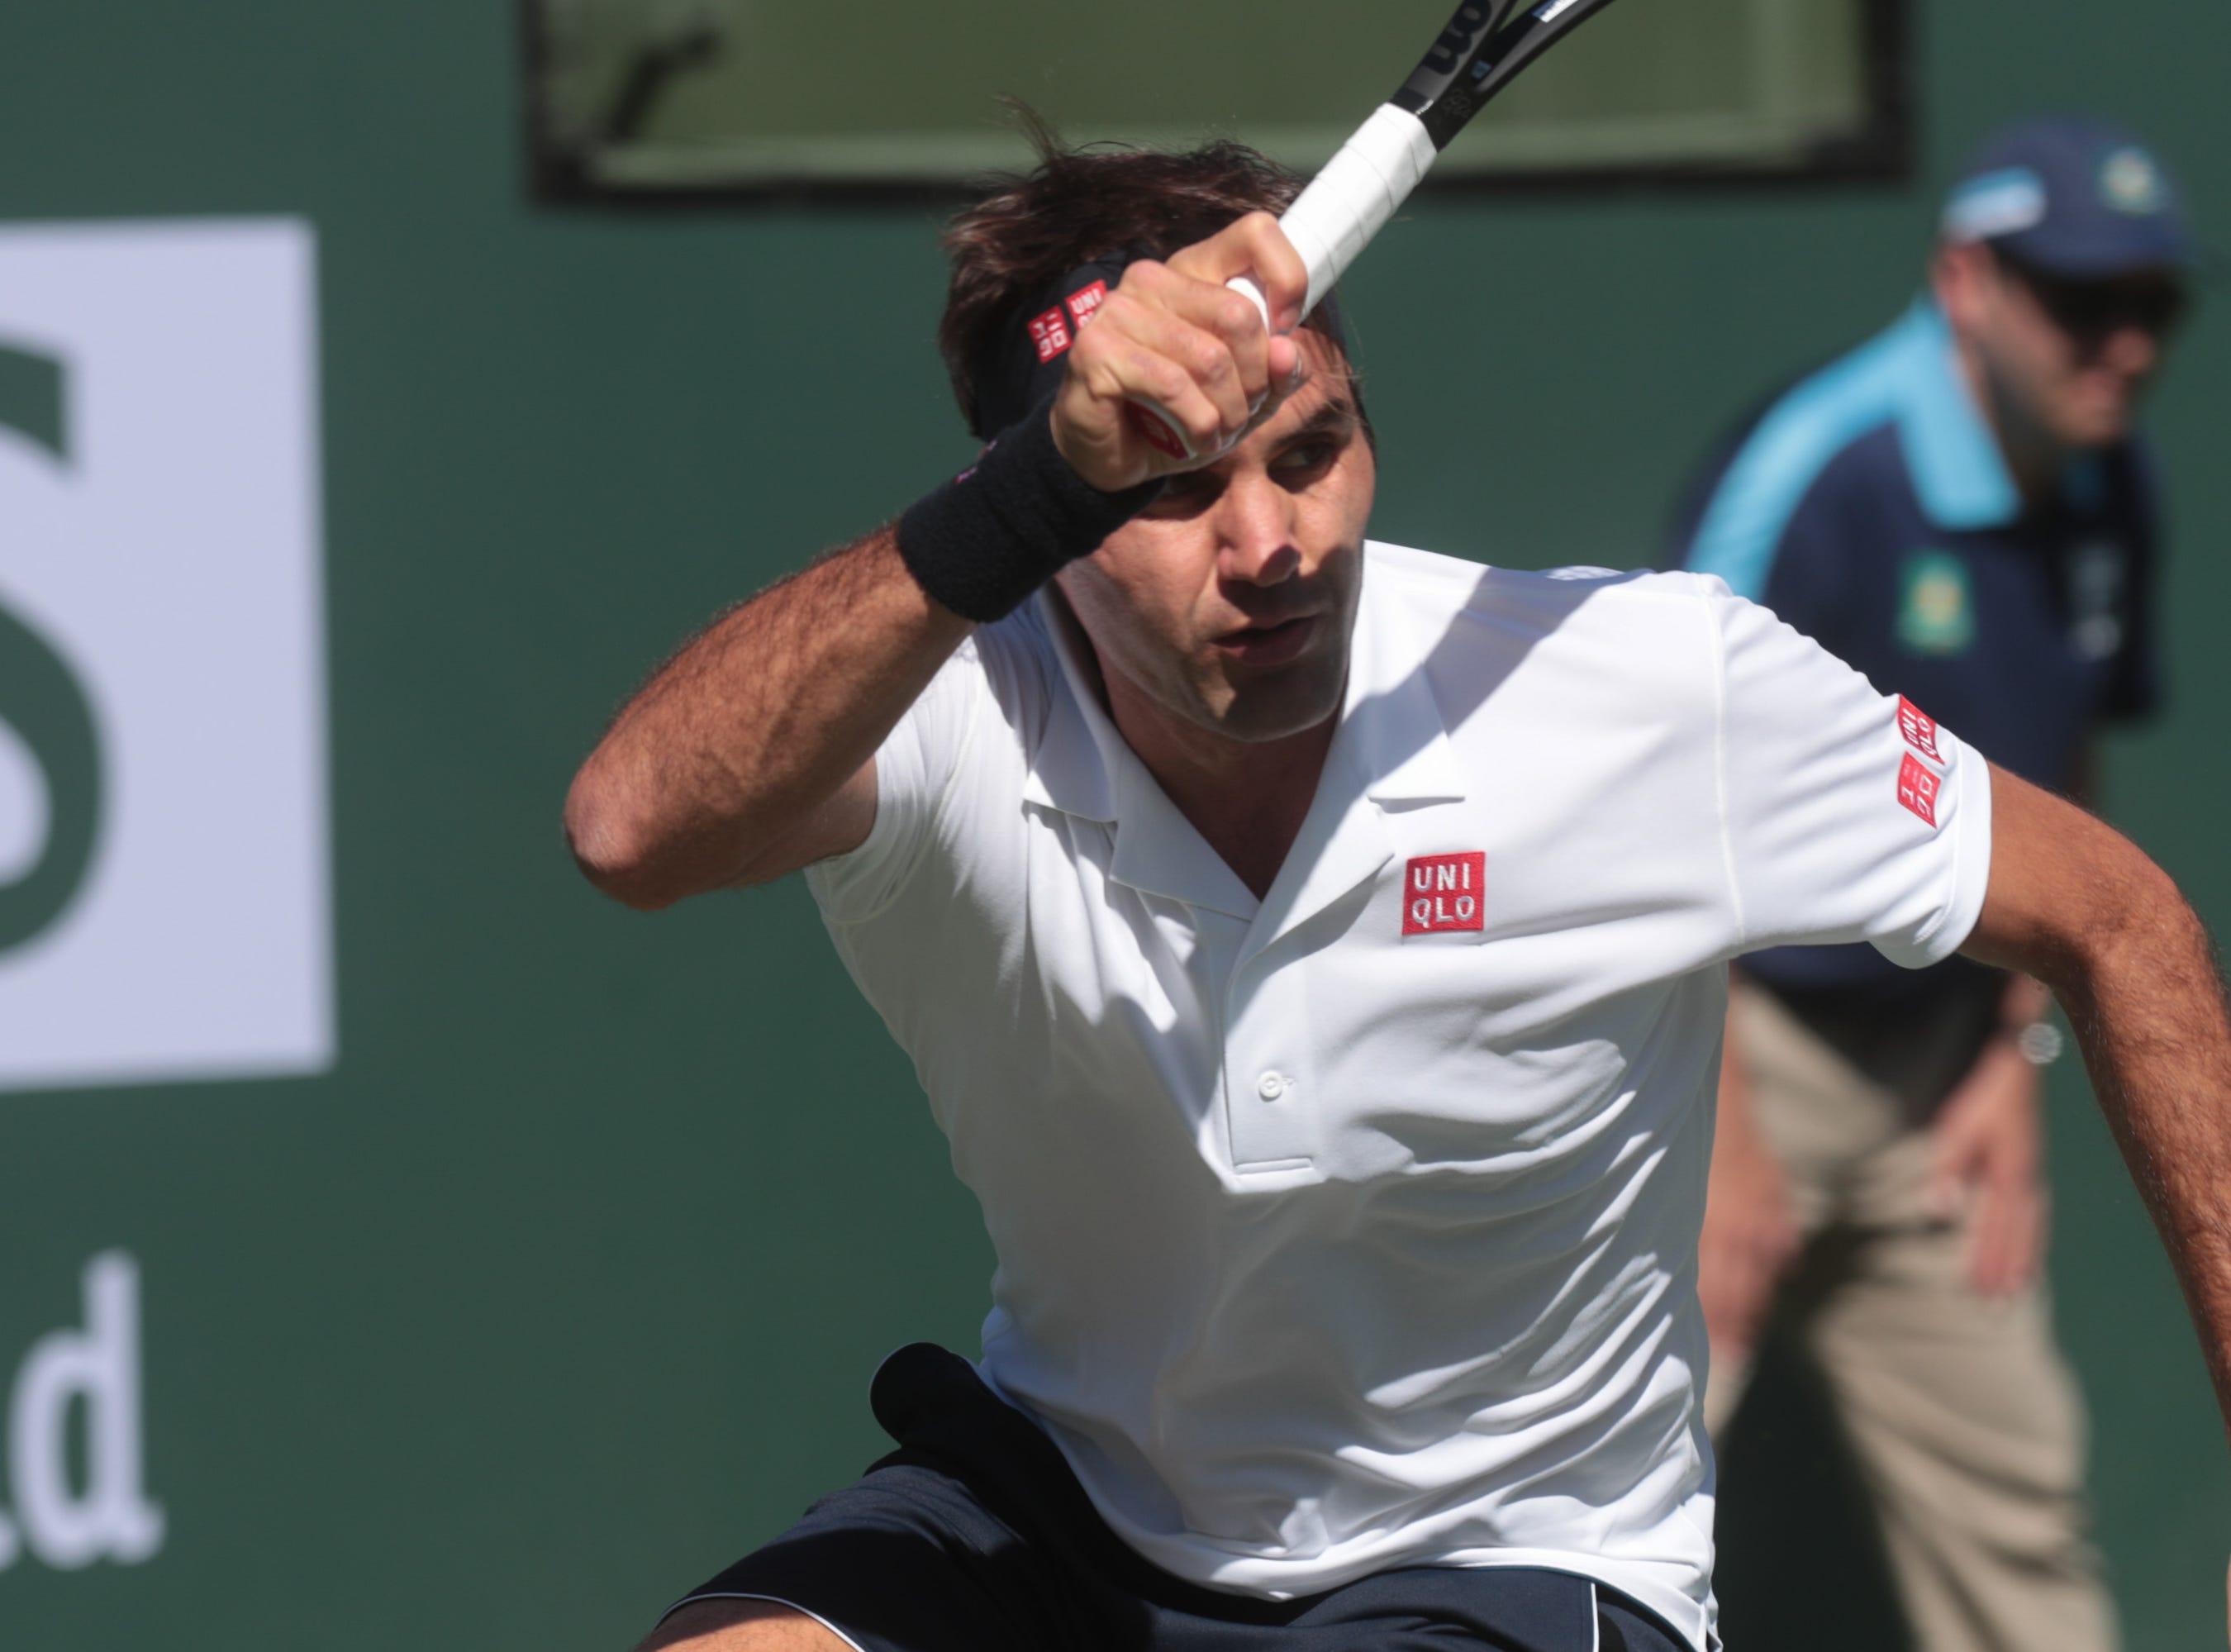 Roger Federer returns to Kyle Edmund at the BNP Paribas Open in Indian Wells, Calif., March 13, 2019.